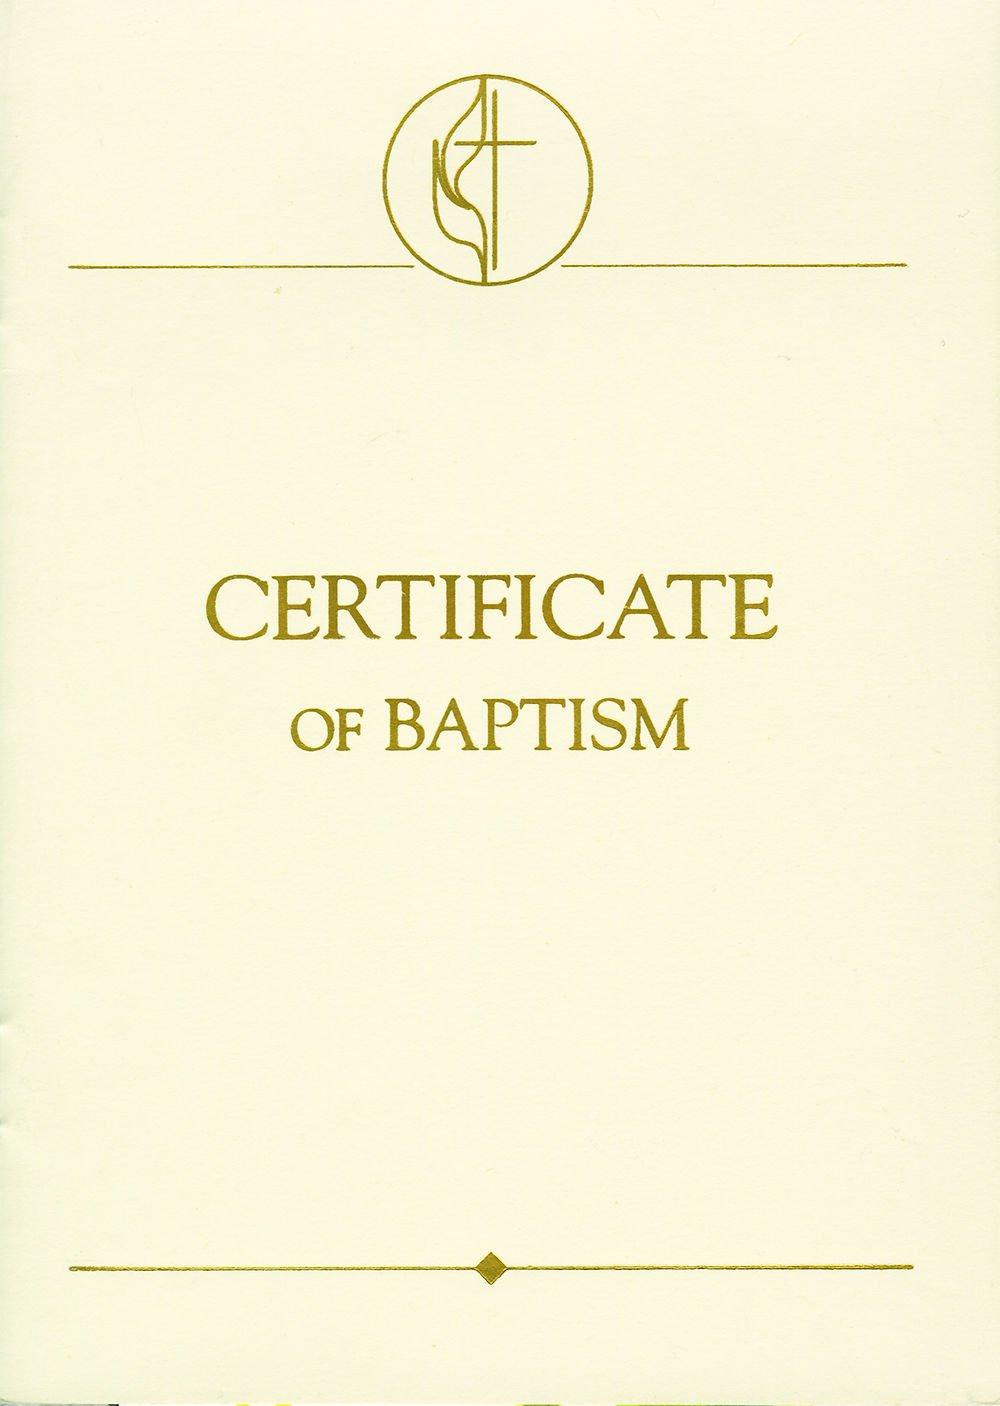 United Methodist Covenant Ii Child Baptism Certificates Pkg Of 3 Abingdon Press 9780687360536 Amazon Com Books United methodist baptism certificate template